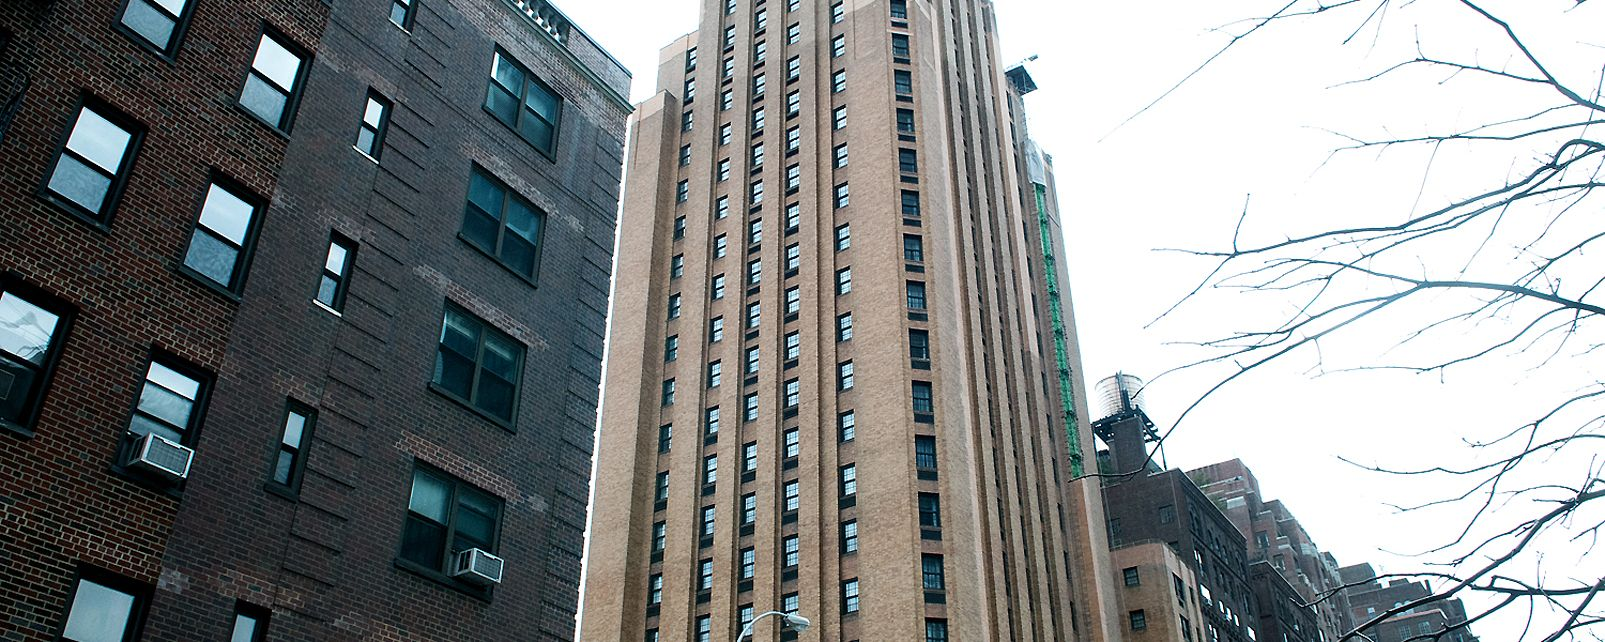 Hotel Beekman Tower